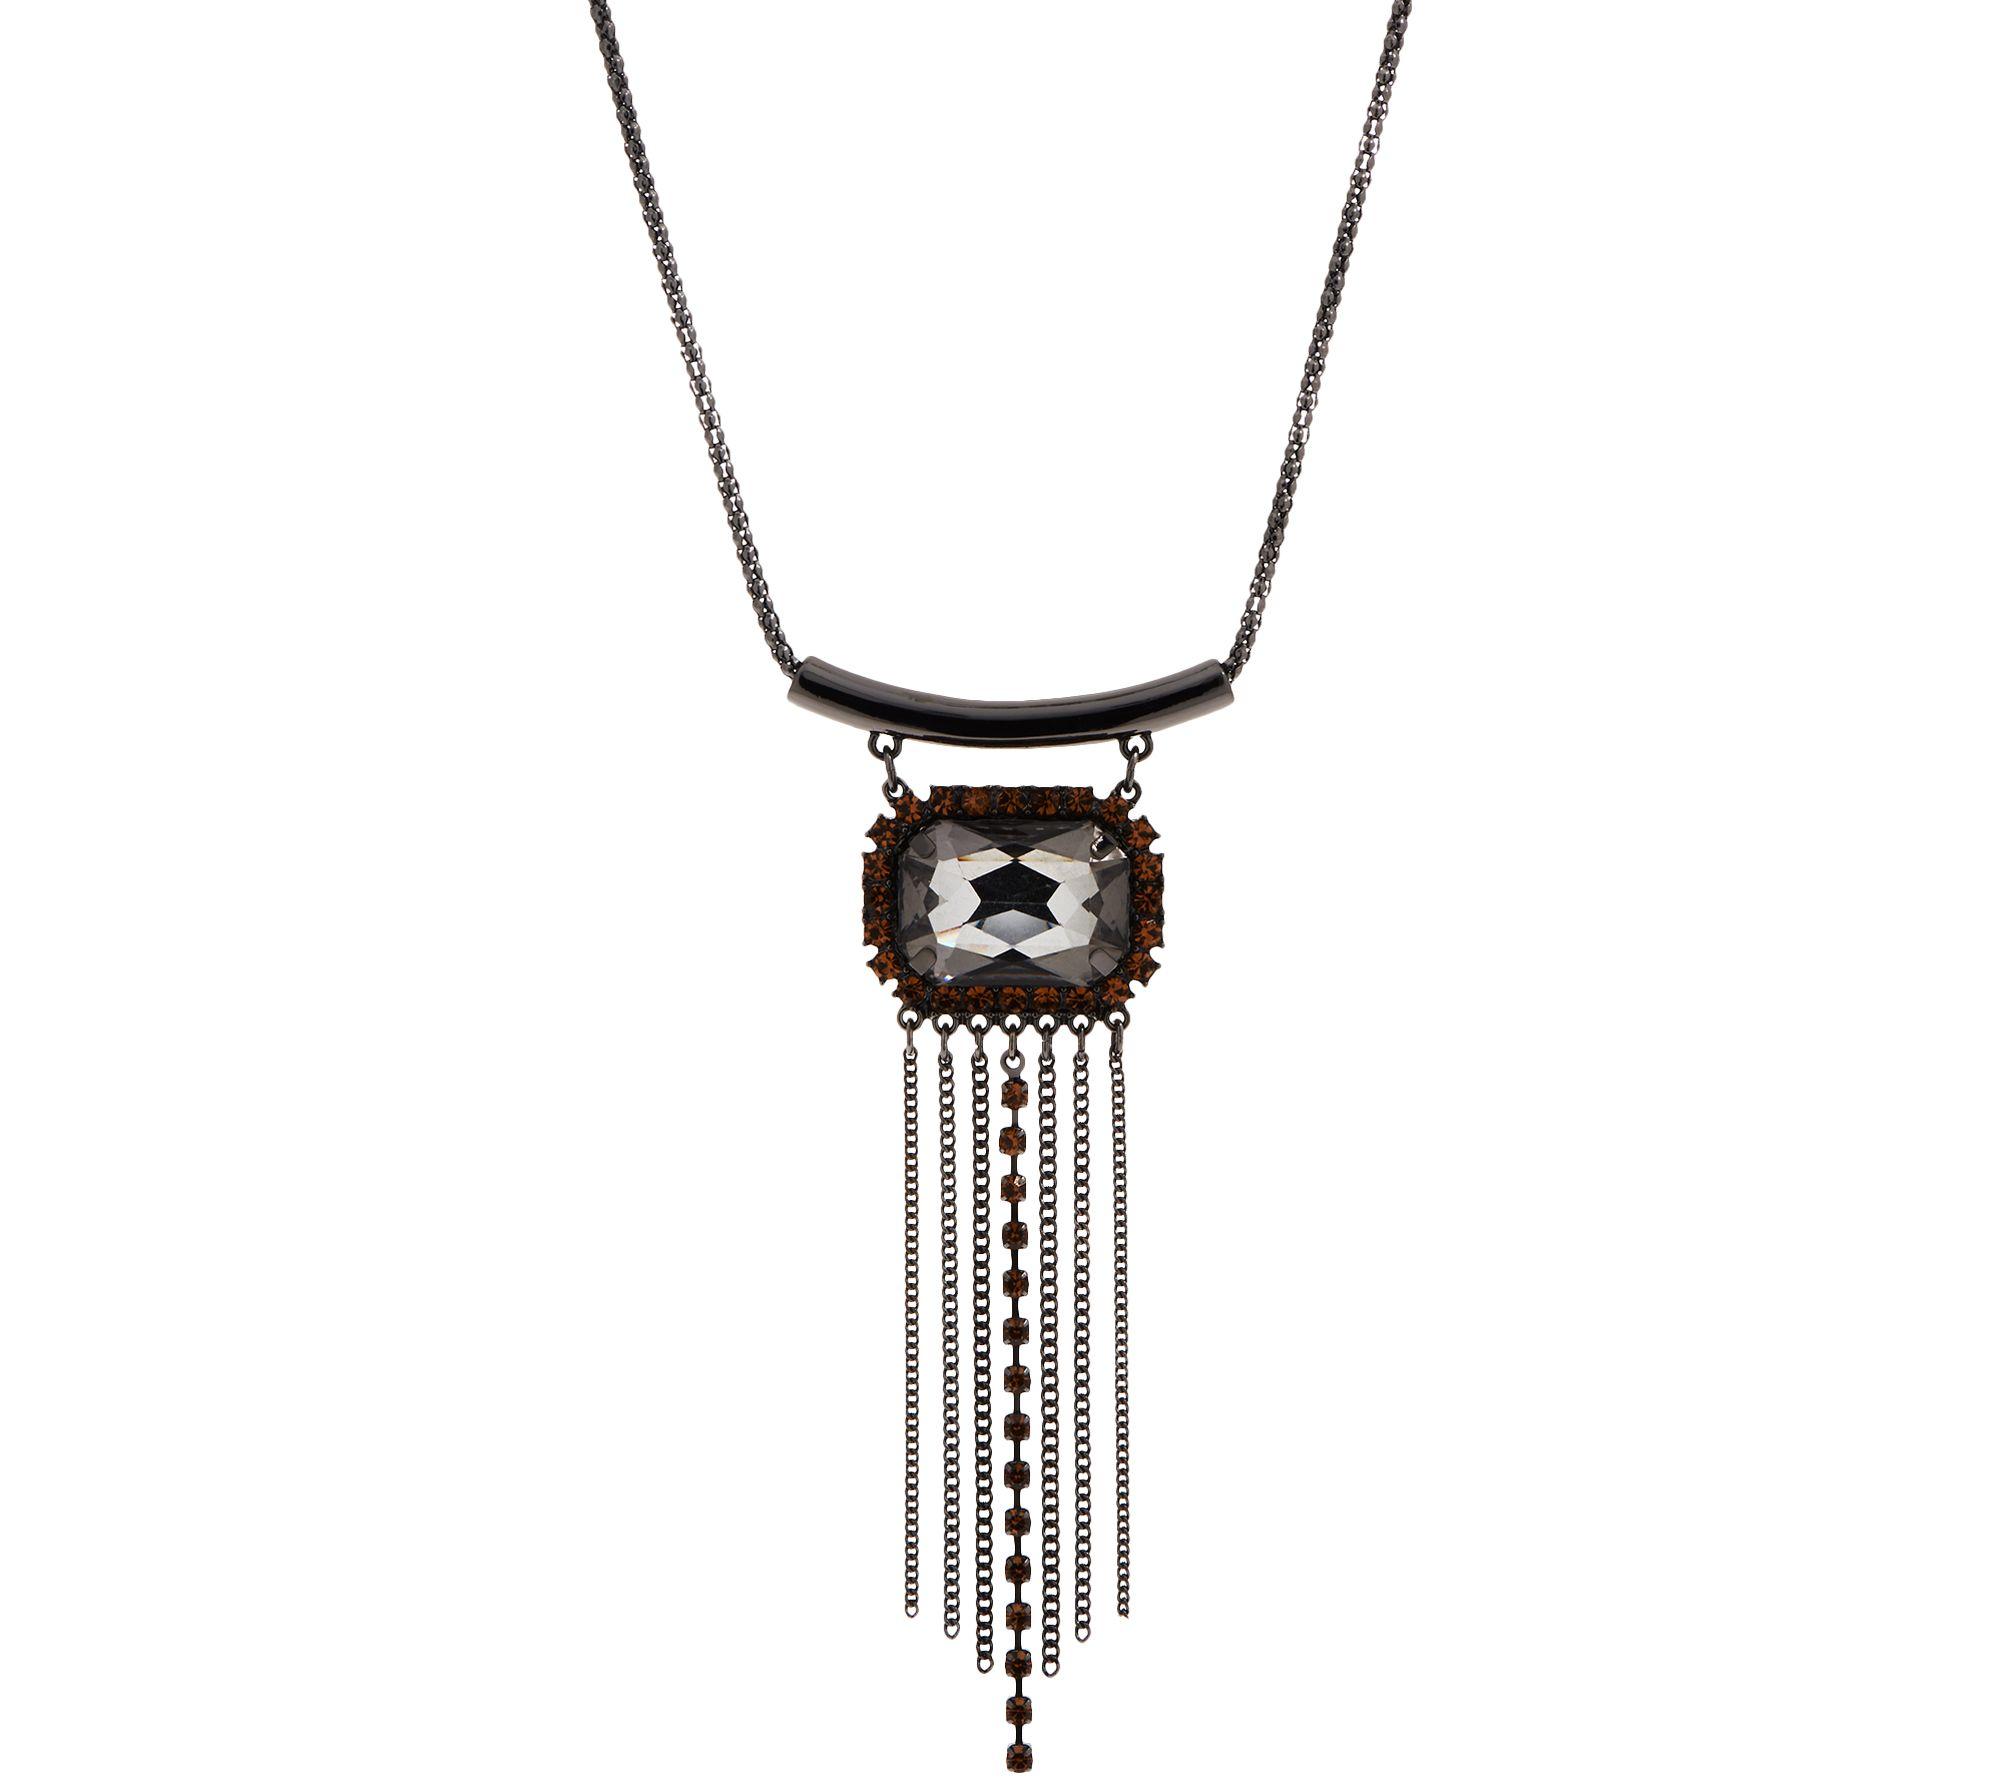 LOGO Links by Lori Goldstein Chandelier Pendant Necklace - J352180